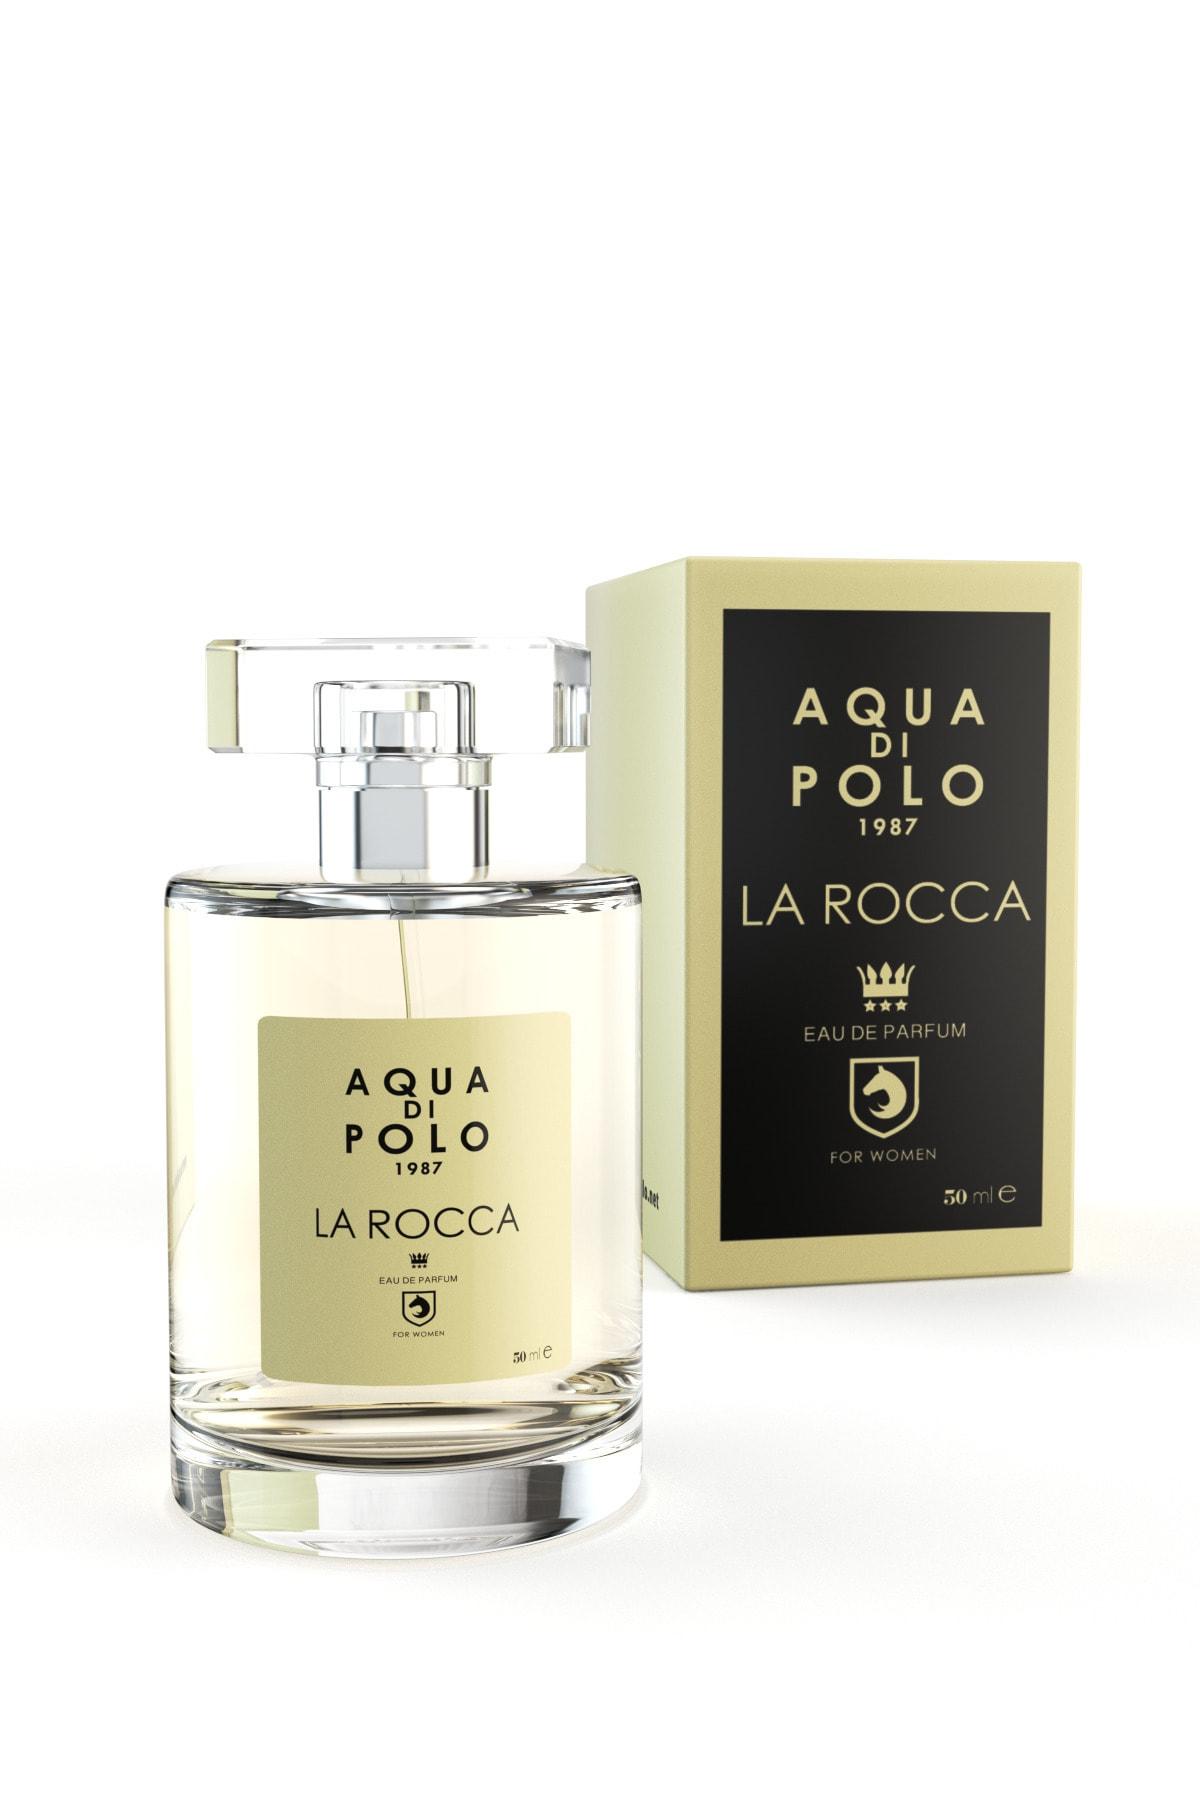 Aqua Di Polo 1987 La Rocca Edp 50 ml Kadın Parfüm PLWMNPR 2